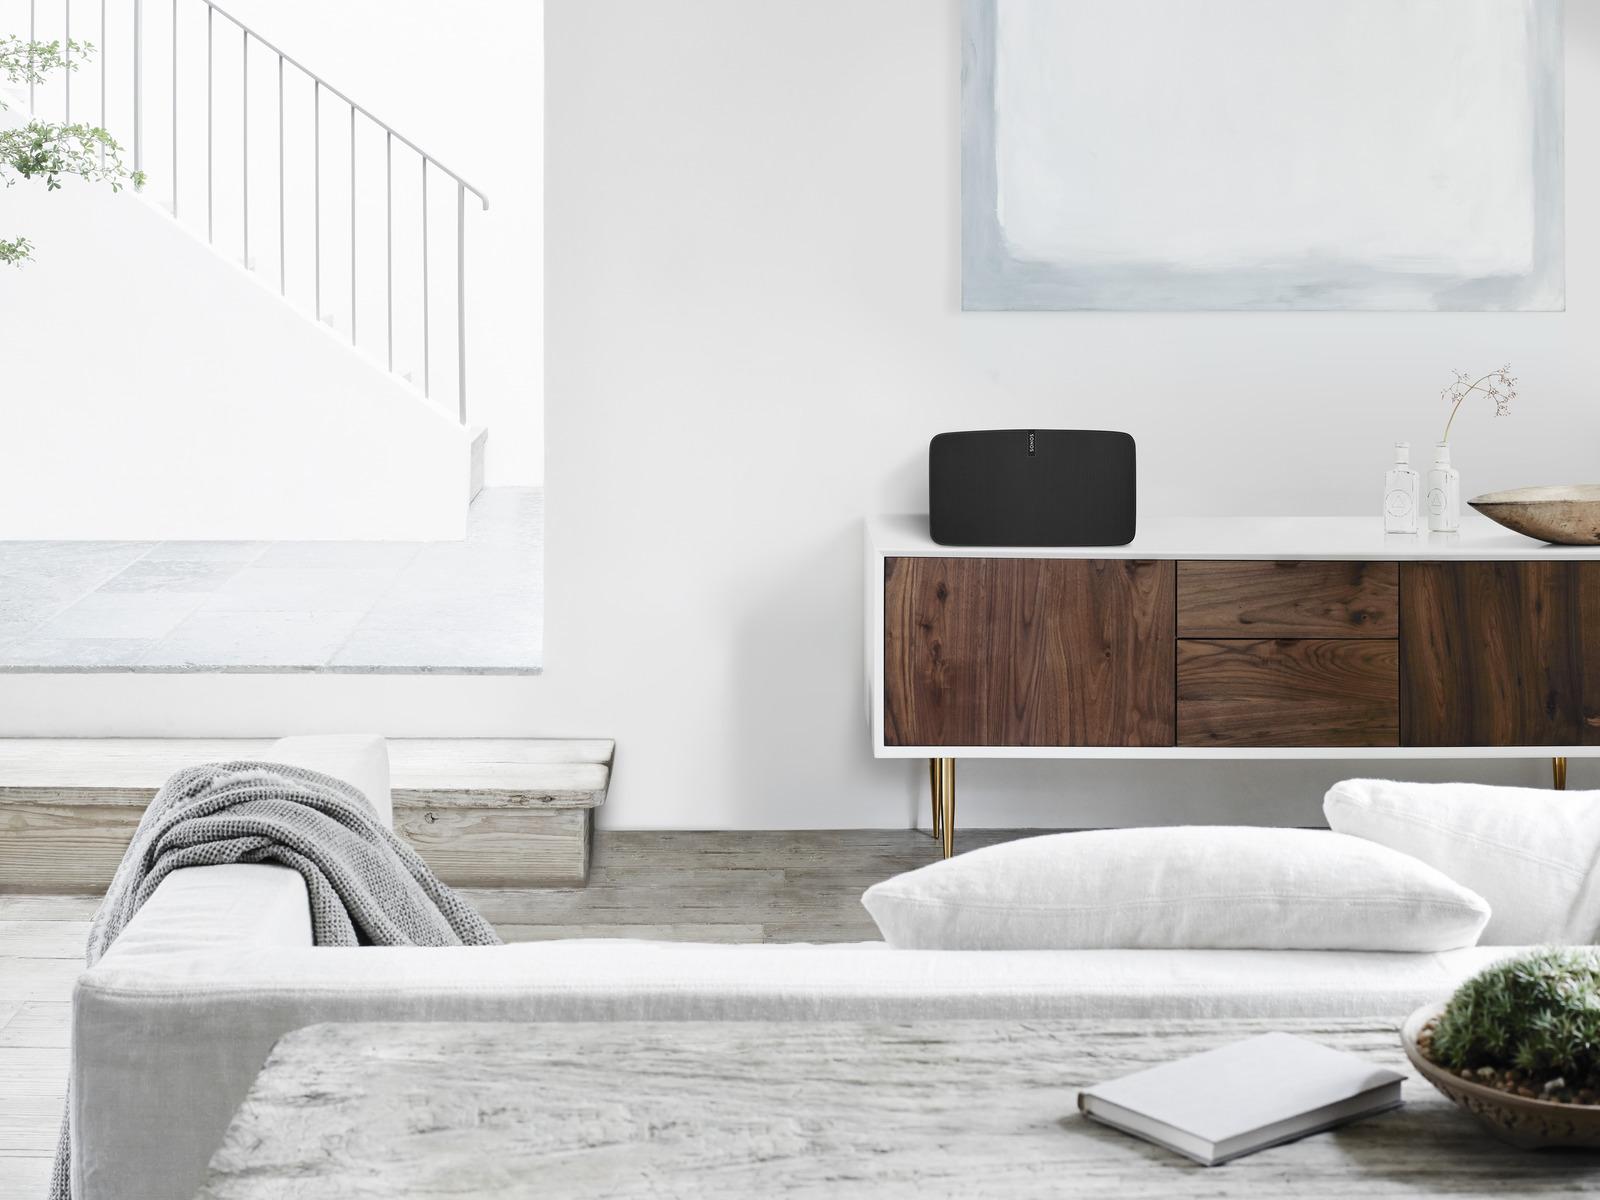 Multi_Room_Audio_Sonos_speaker_scandanavian_style_living_room_White_Walls_Floor_Grey_Sofa